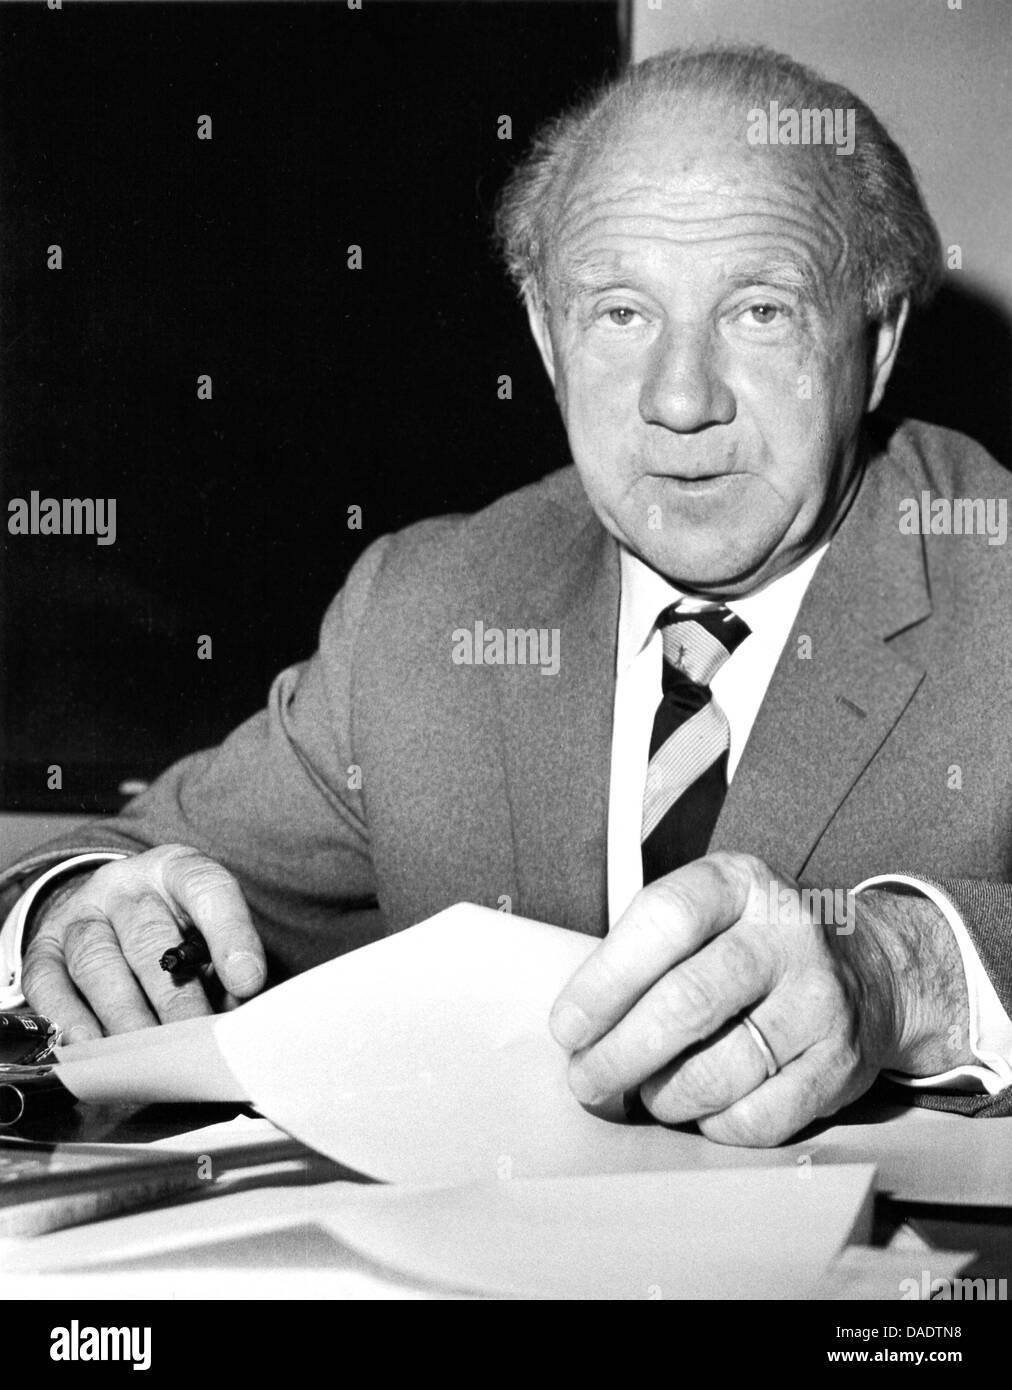 werner heisenberg in 1961 portrait by photographer fred stein stock